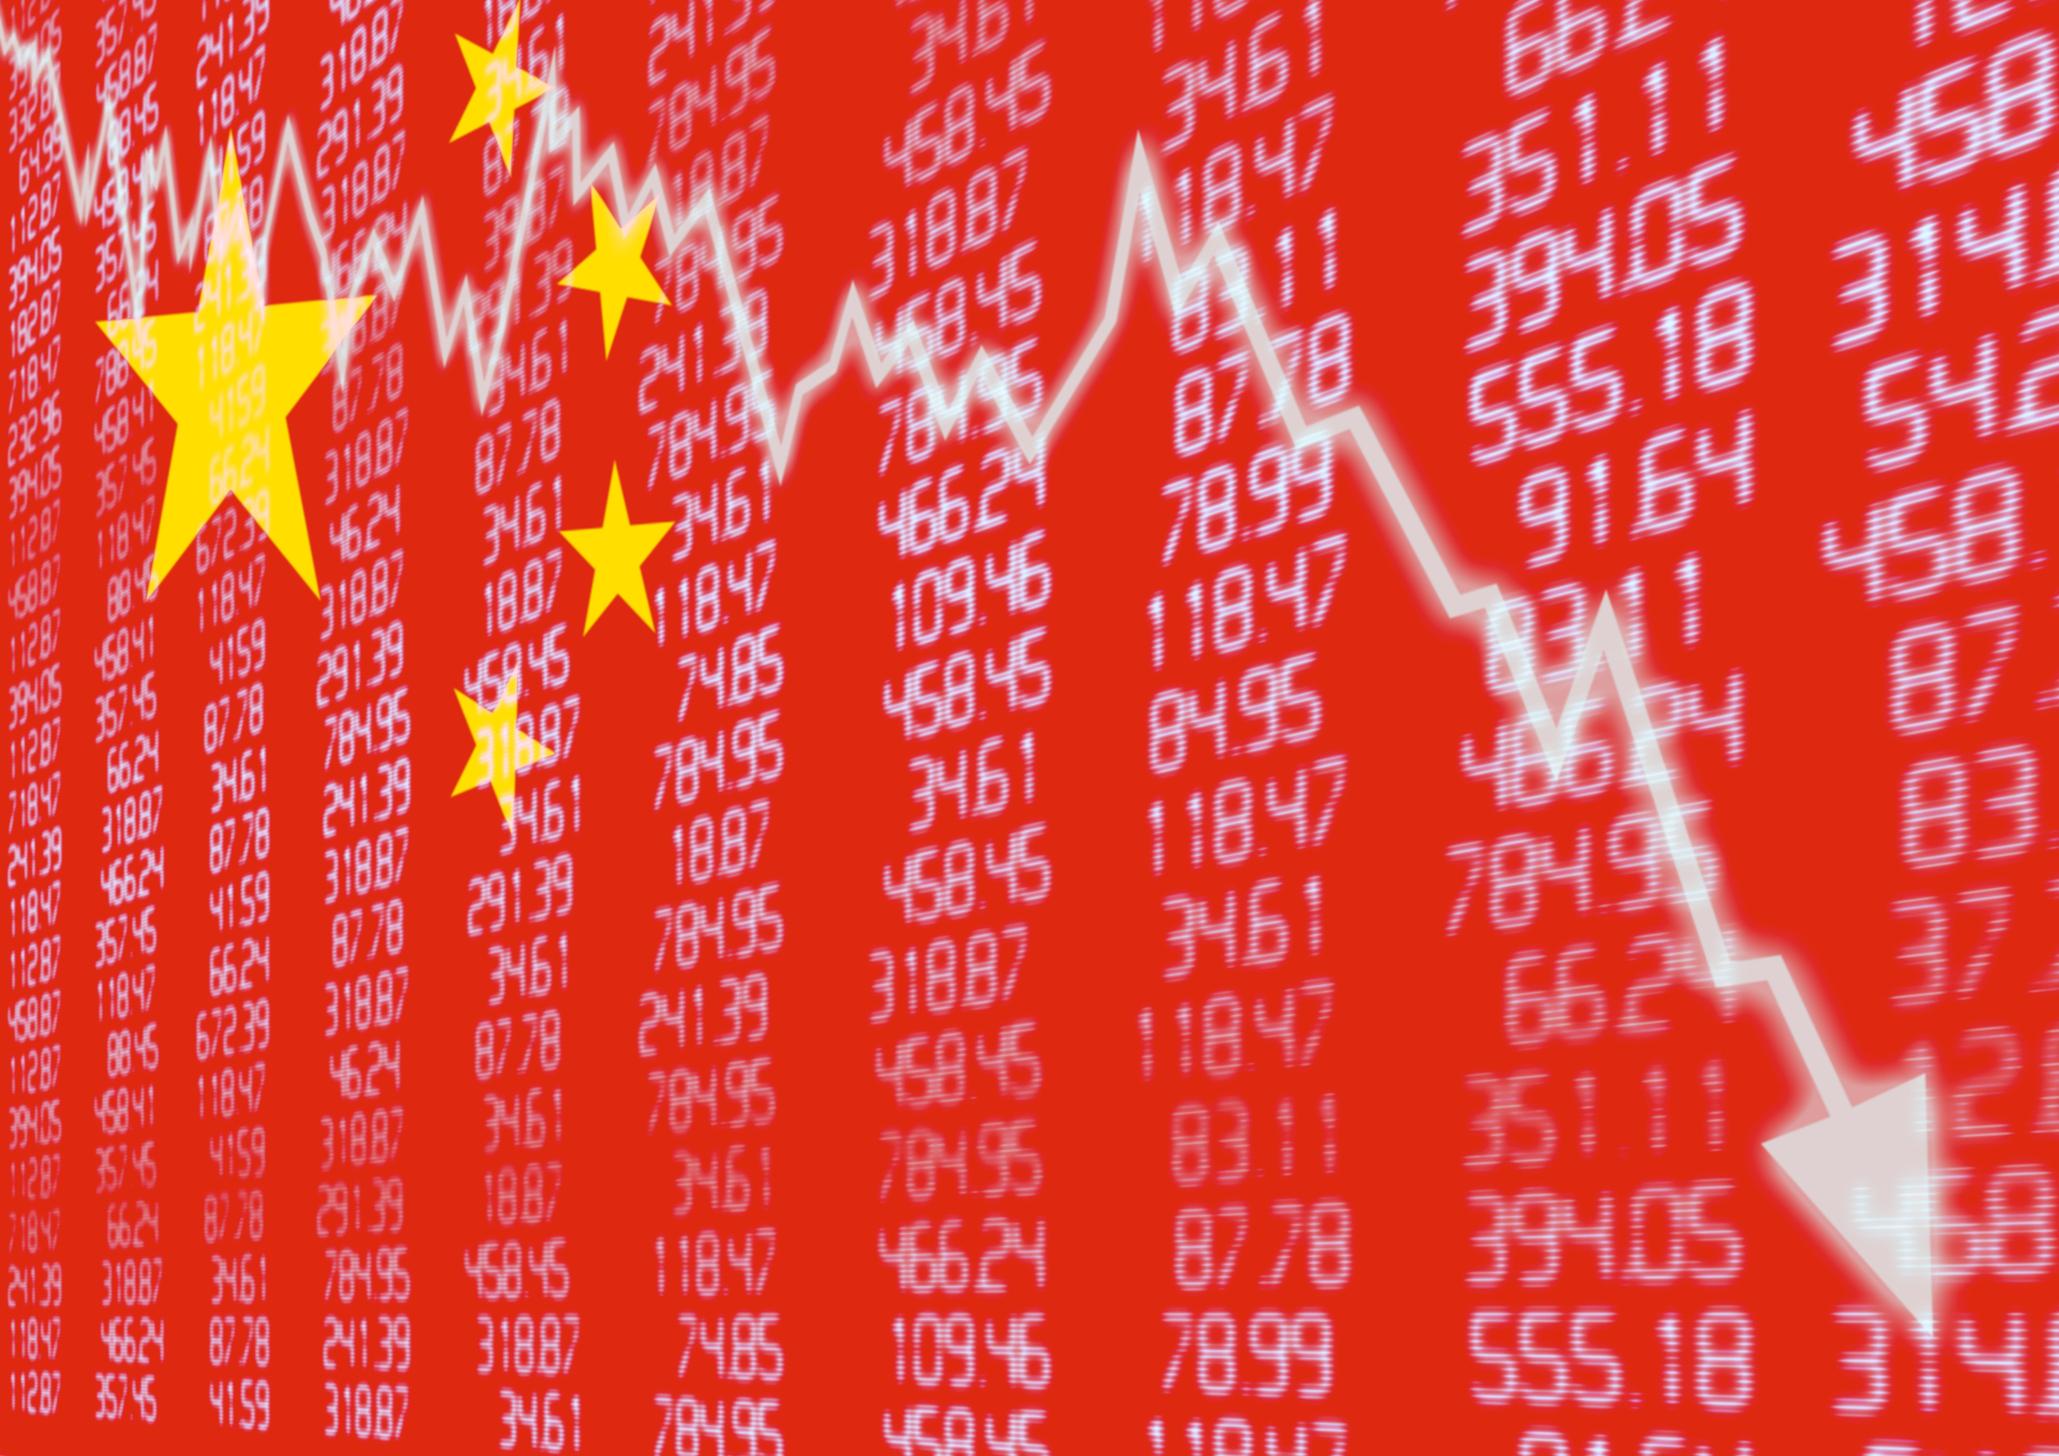 Chinese flag superimposed on falling stock market chart.